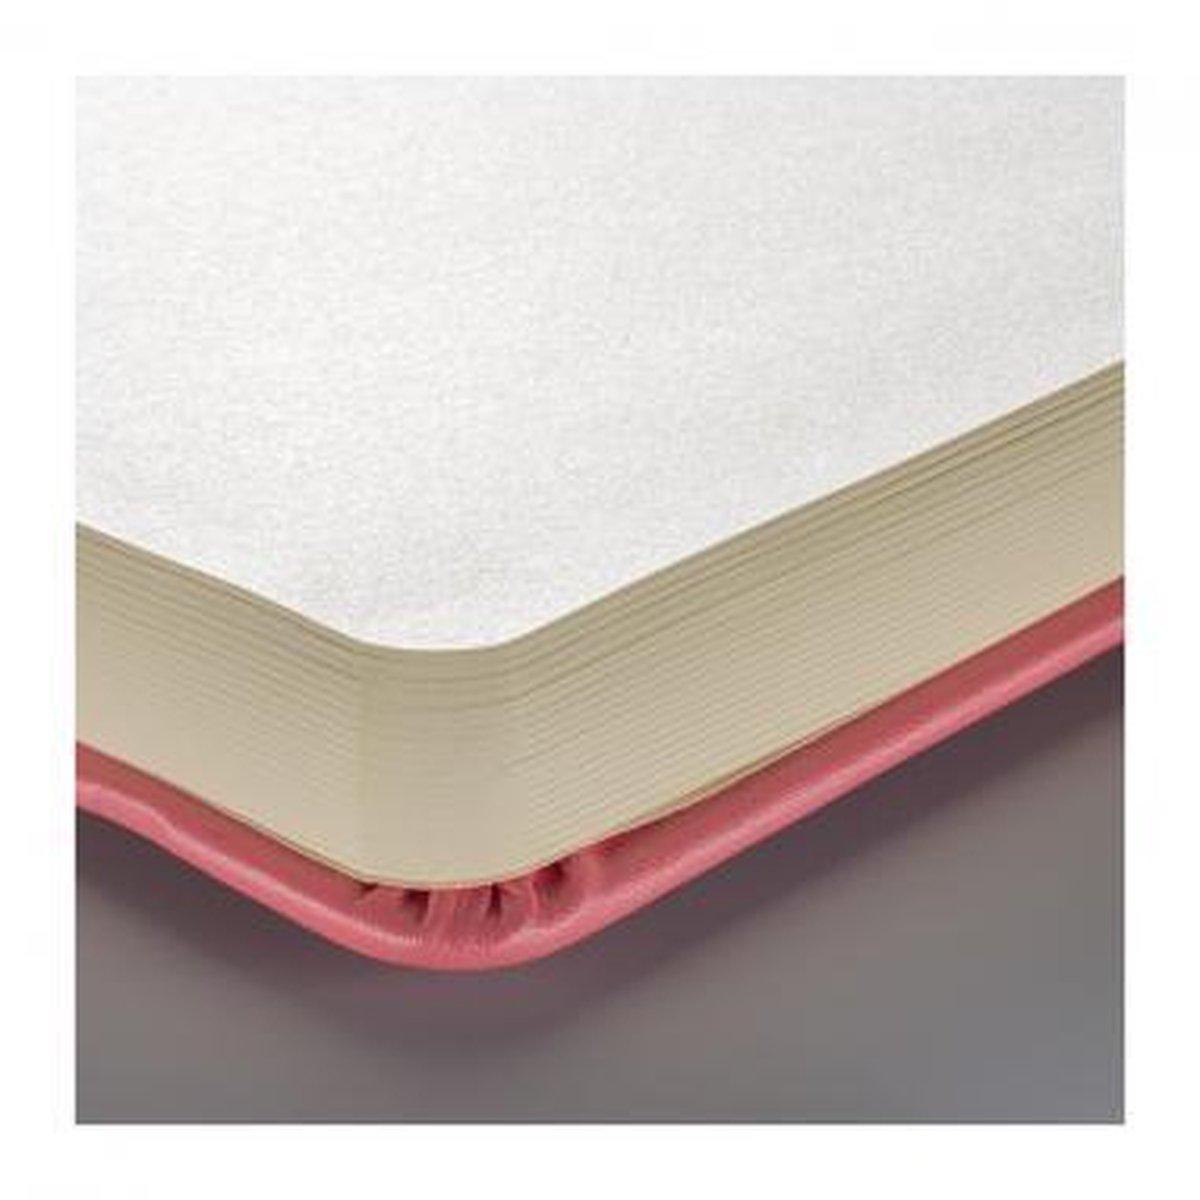 9314311m,Talens art creation schetsboek 9x14 80 vel coral